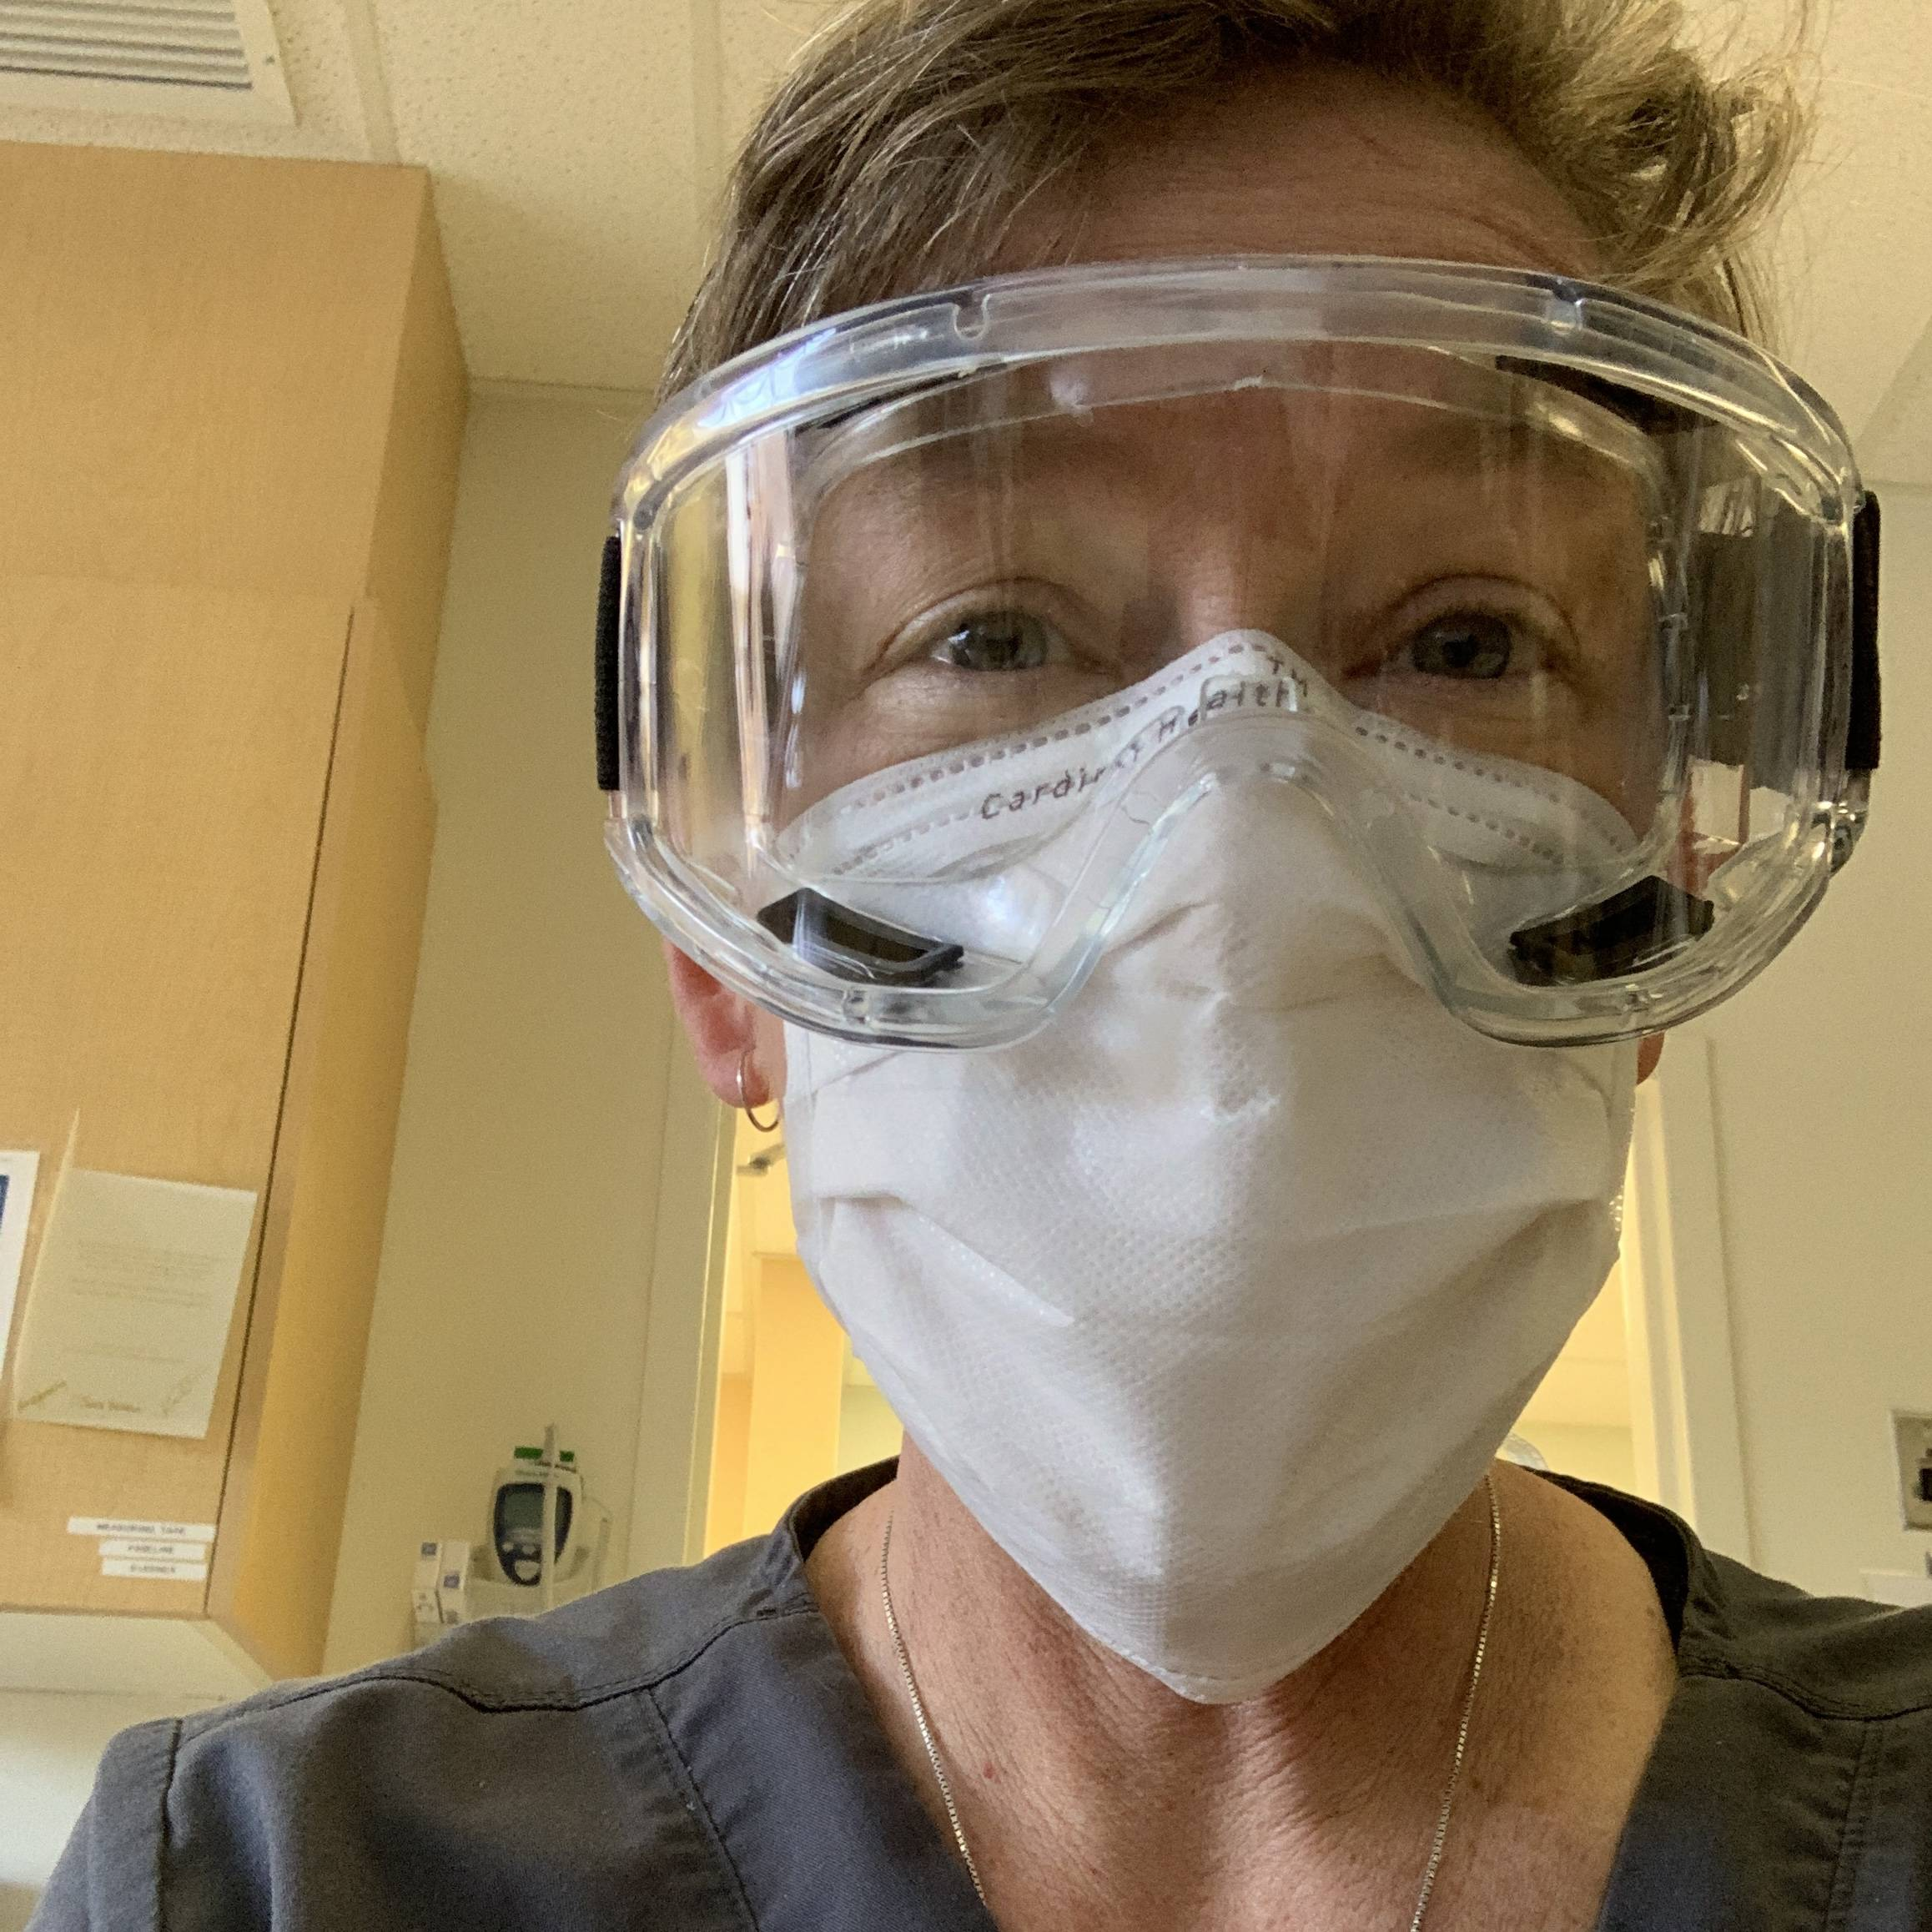 NICU Nurse Trish Ringley in PPE caring for preemies